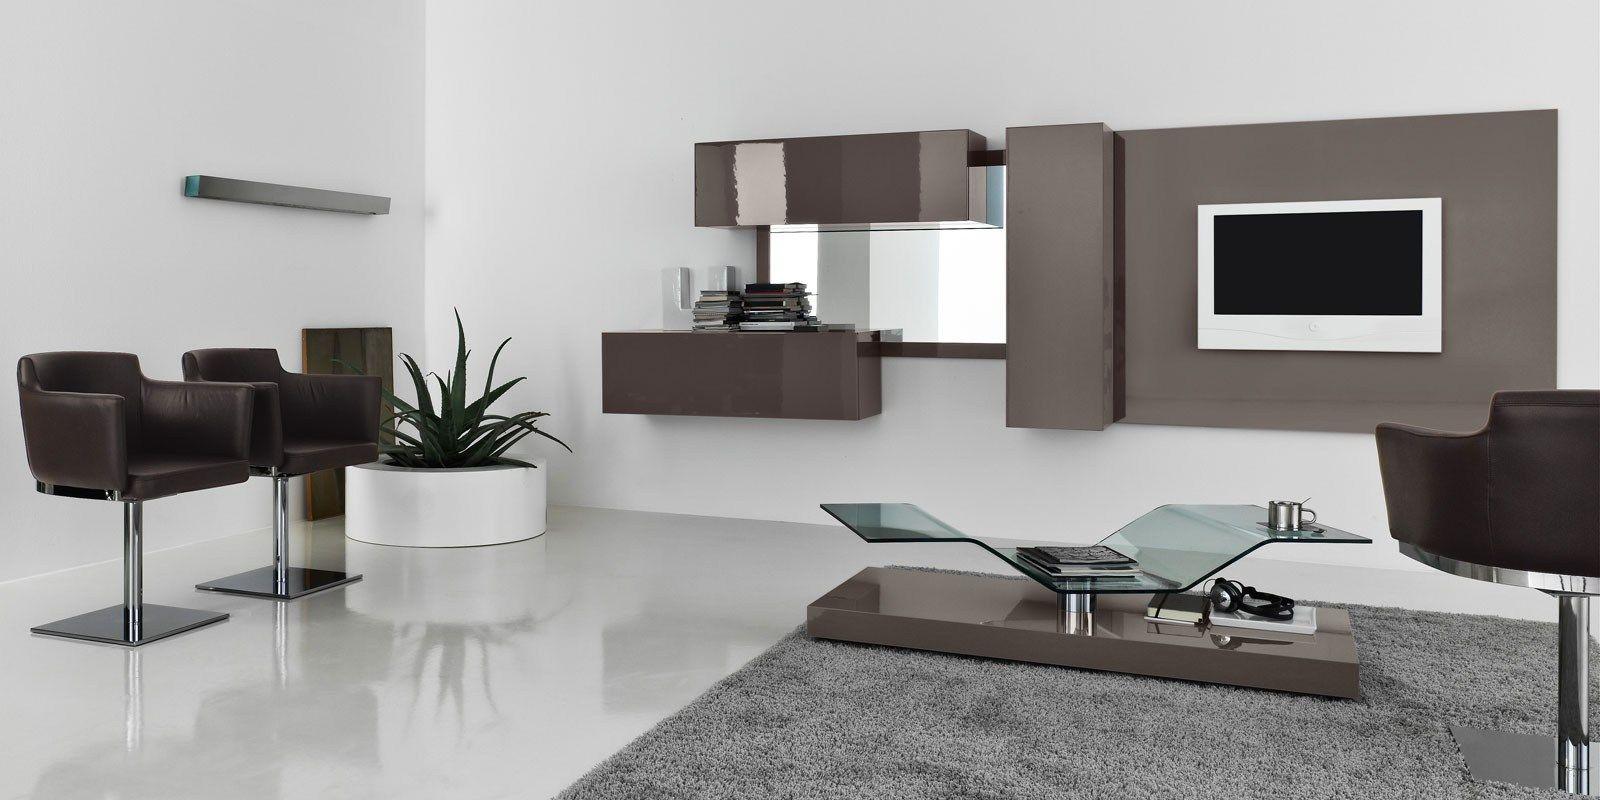 wohnwand modern italian interessante ideen. Black Bedroom Furniture Sets. Home Design Ideas